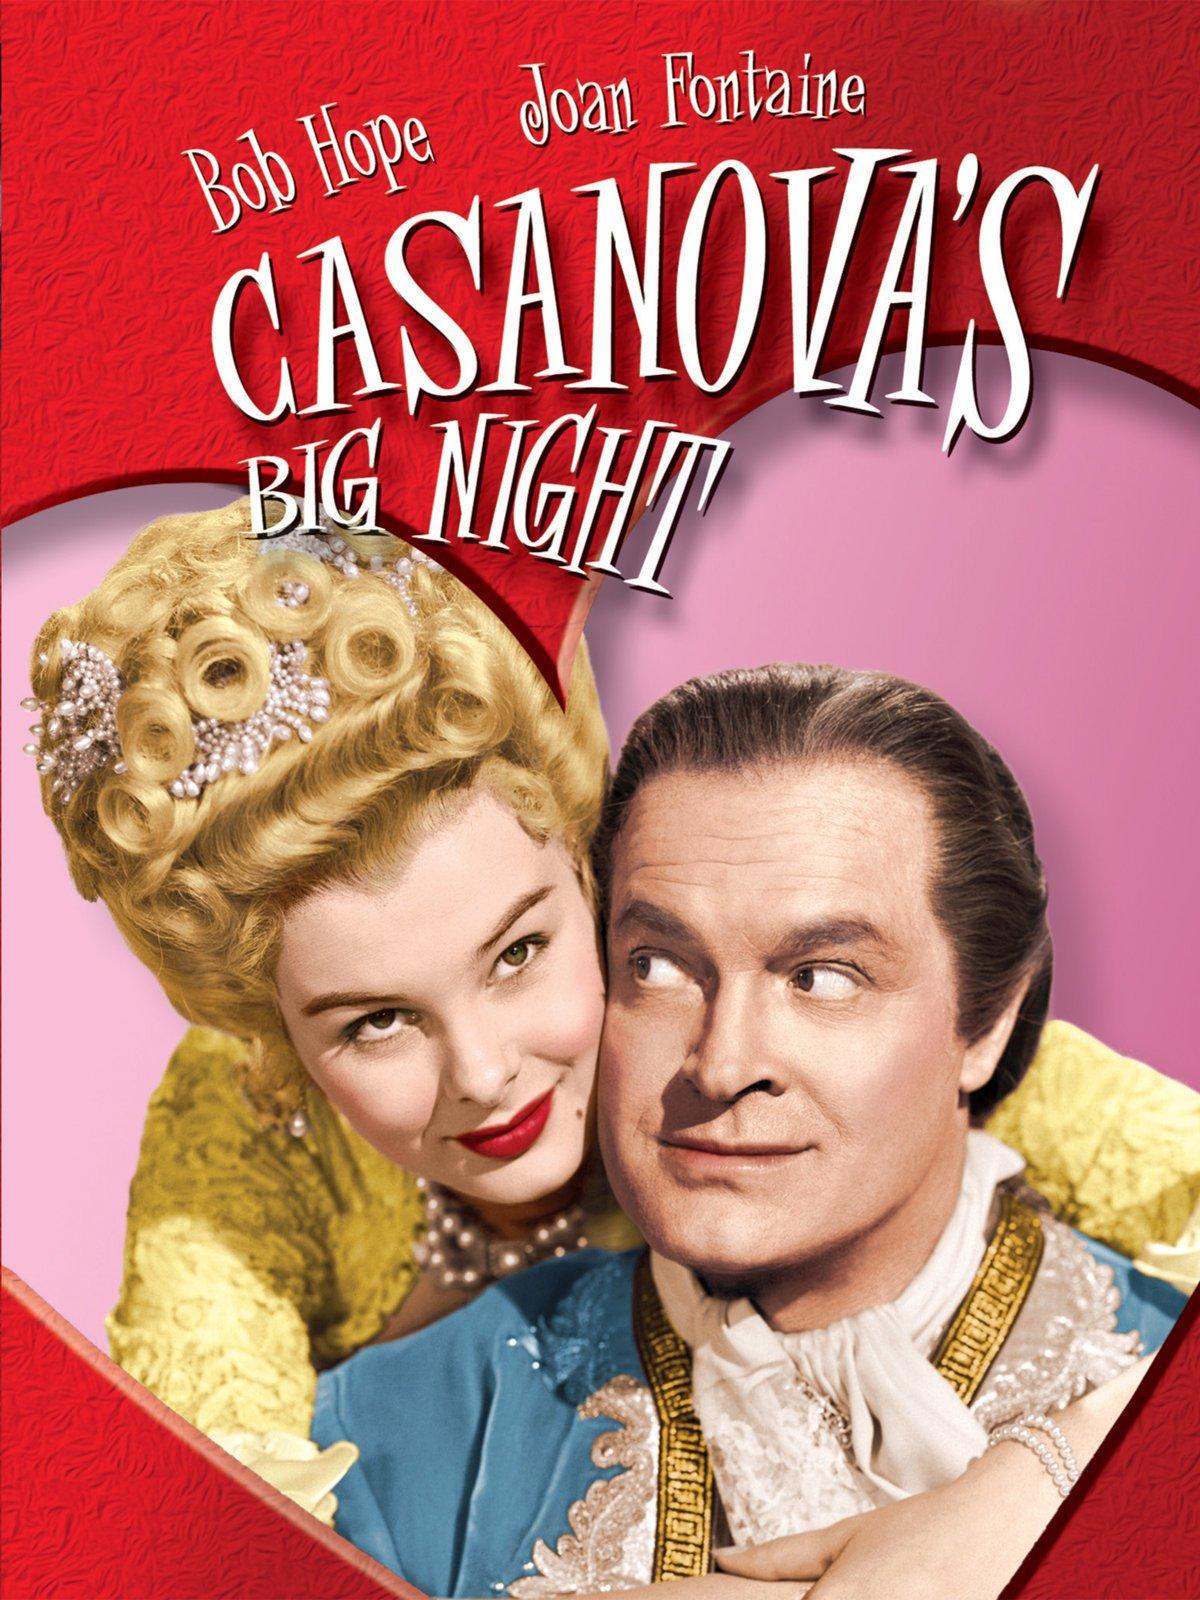 Casanova's Big Night by